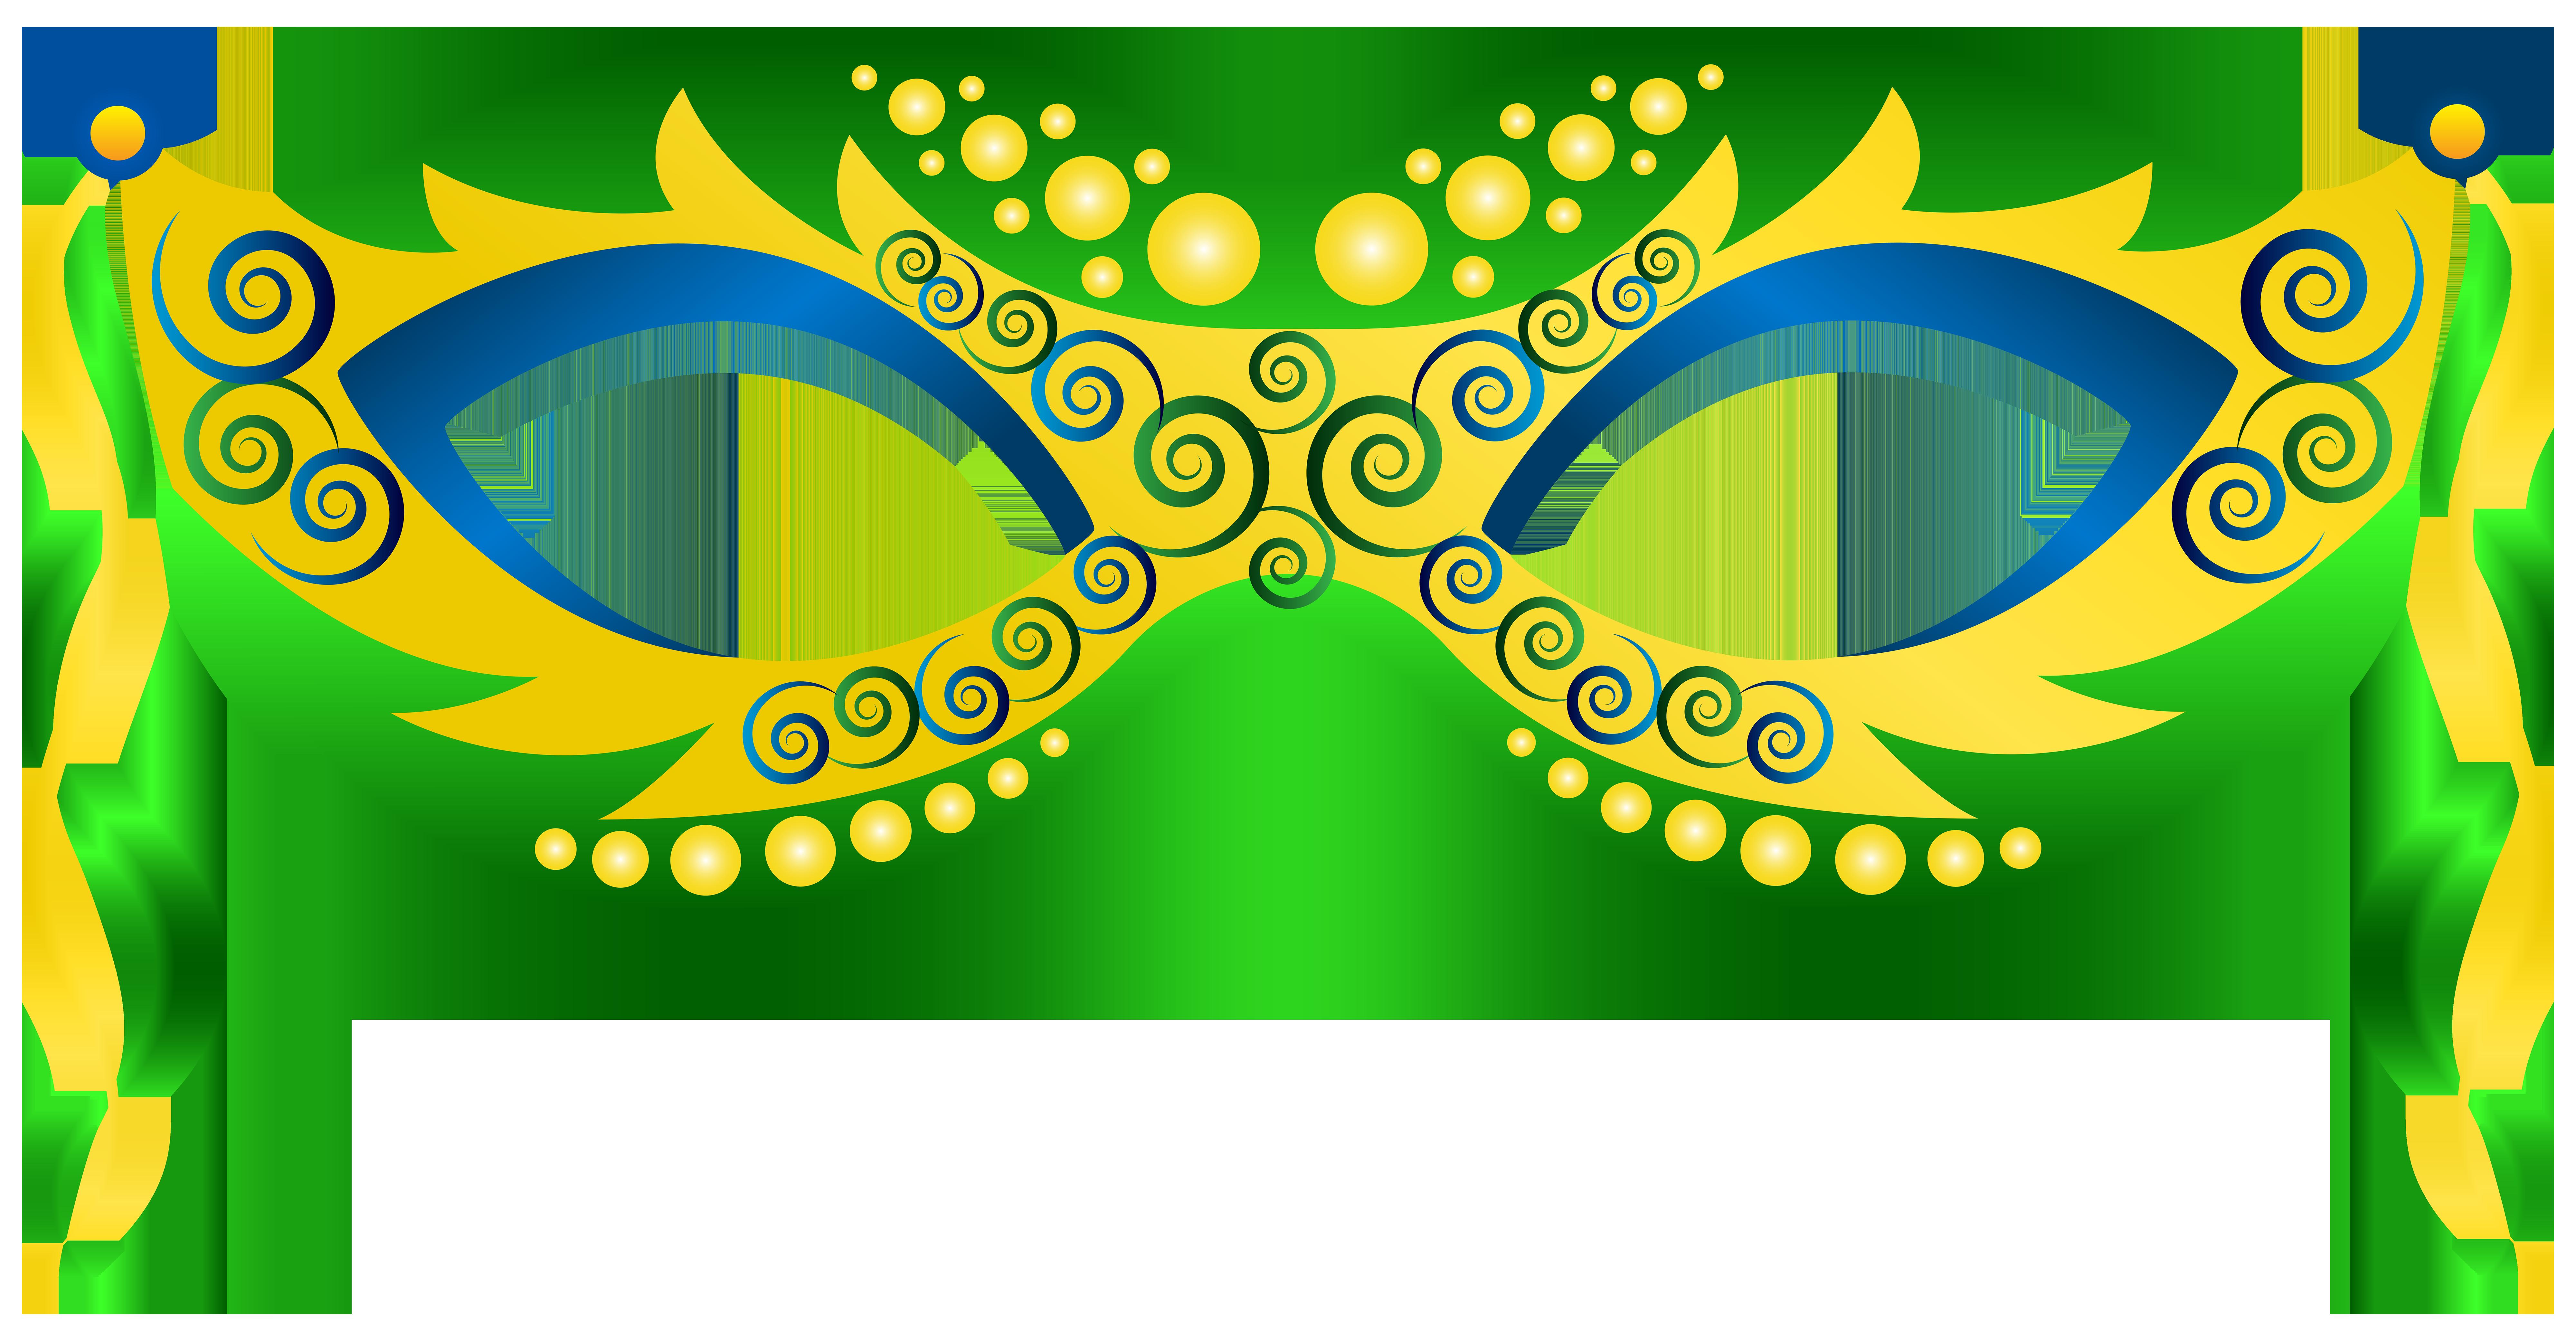 8000x4149 Green Yellow Carnival Mask Png Clip Art Imageu200b Gallery